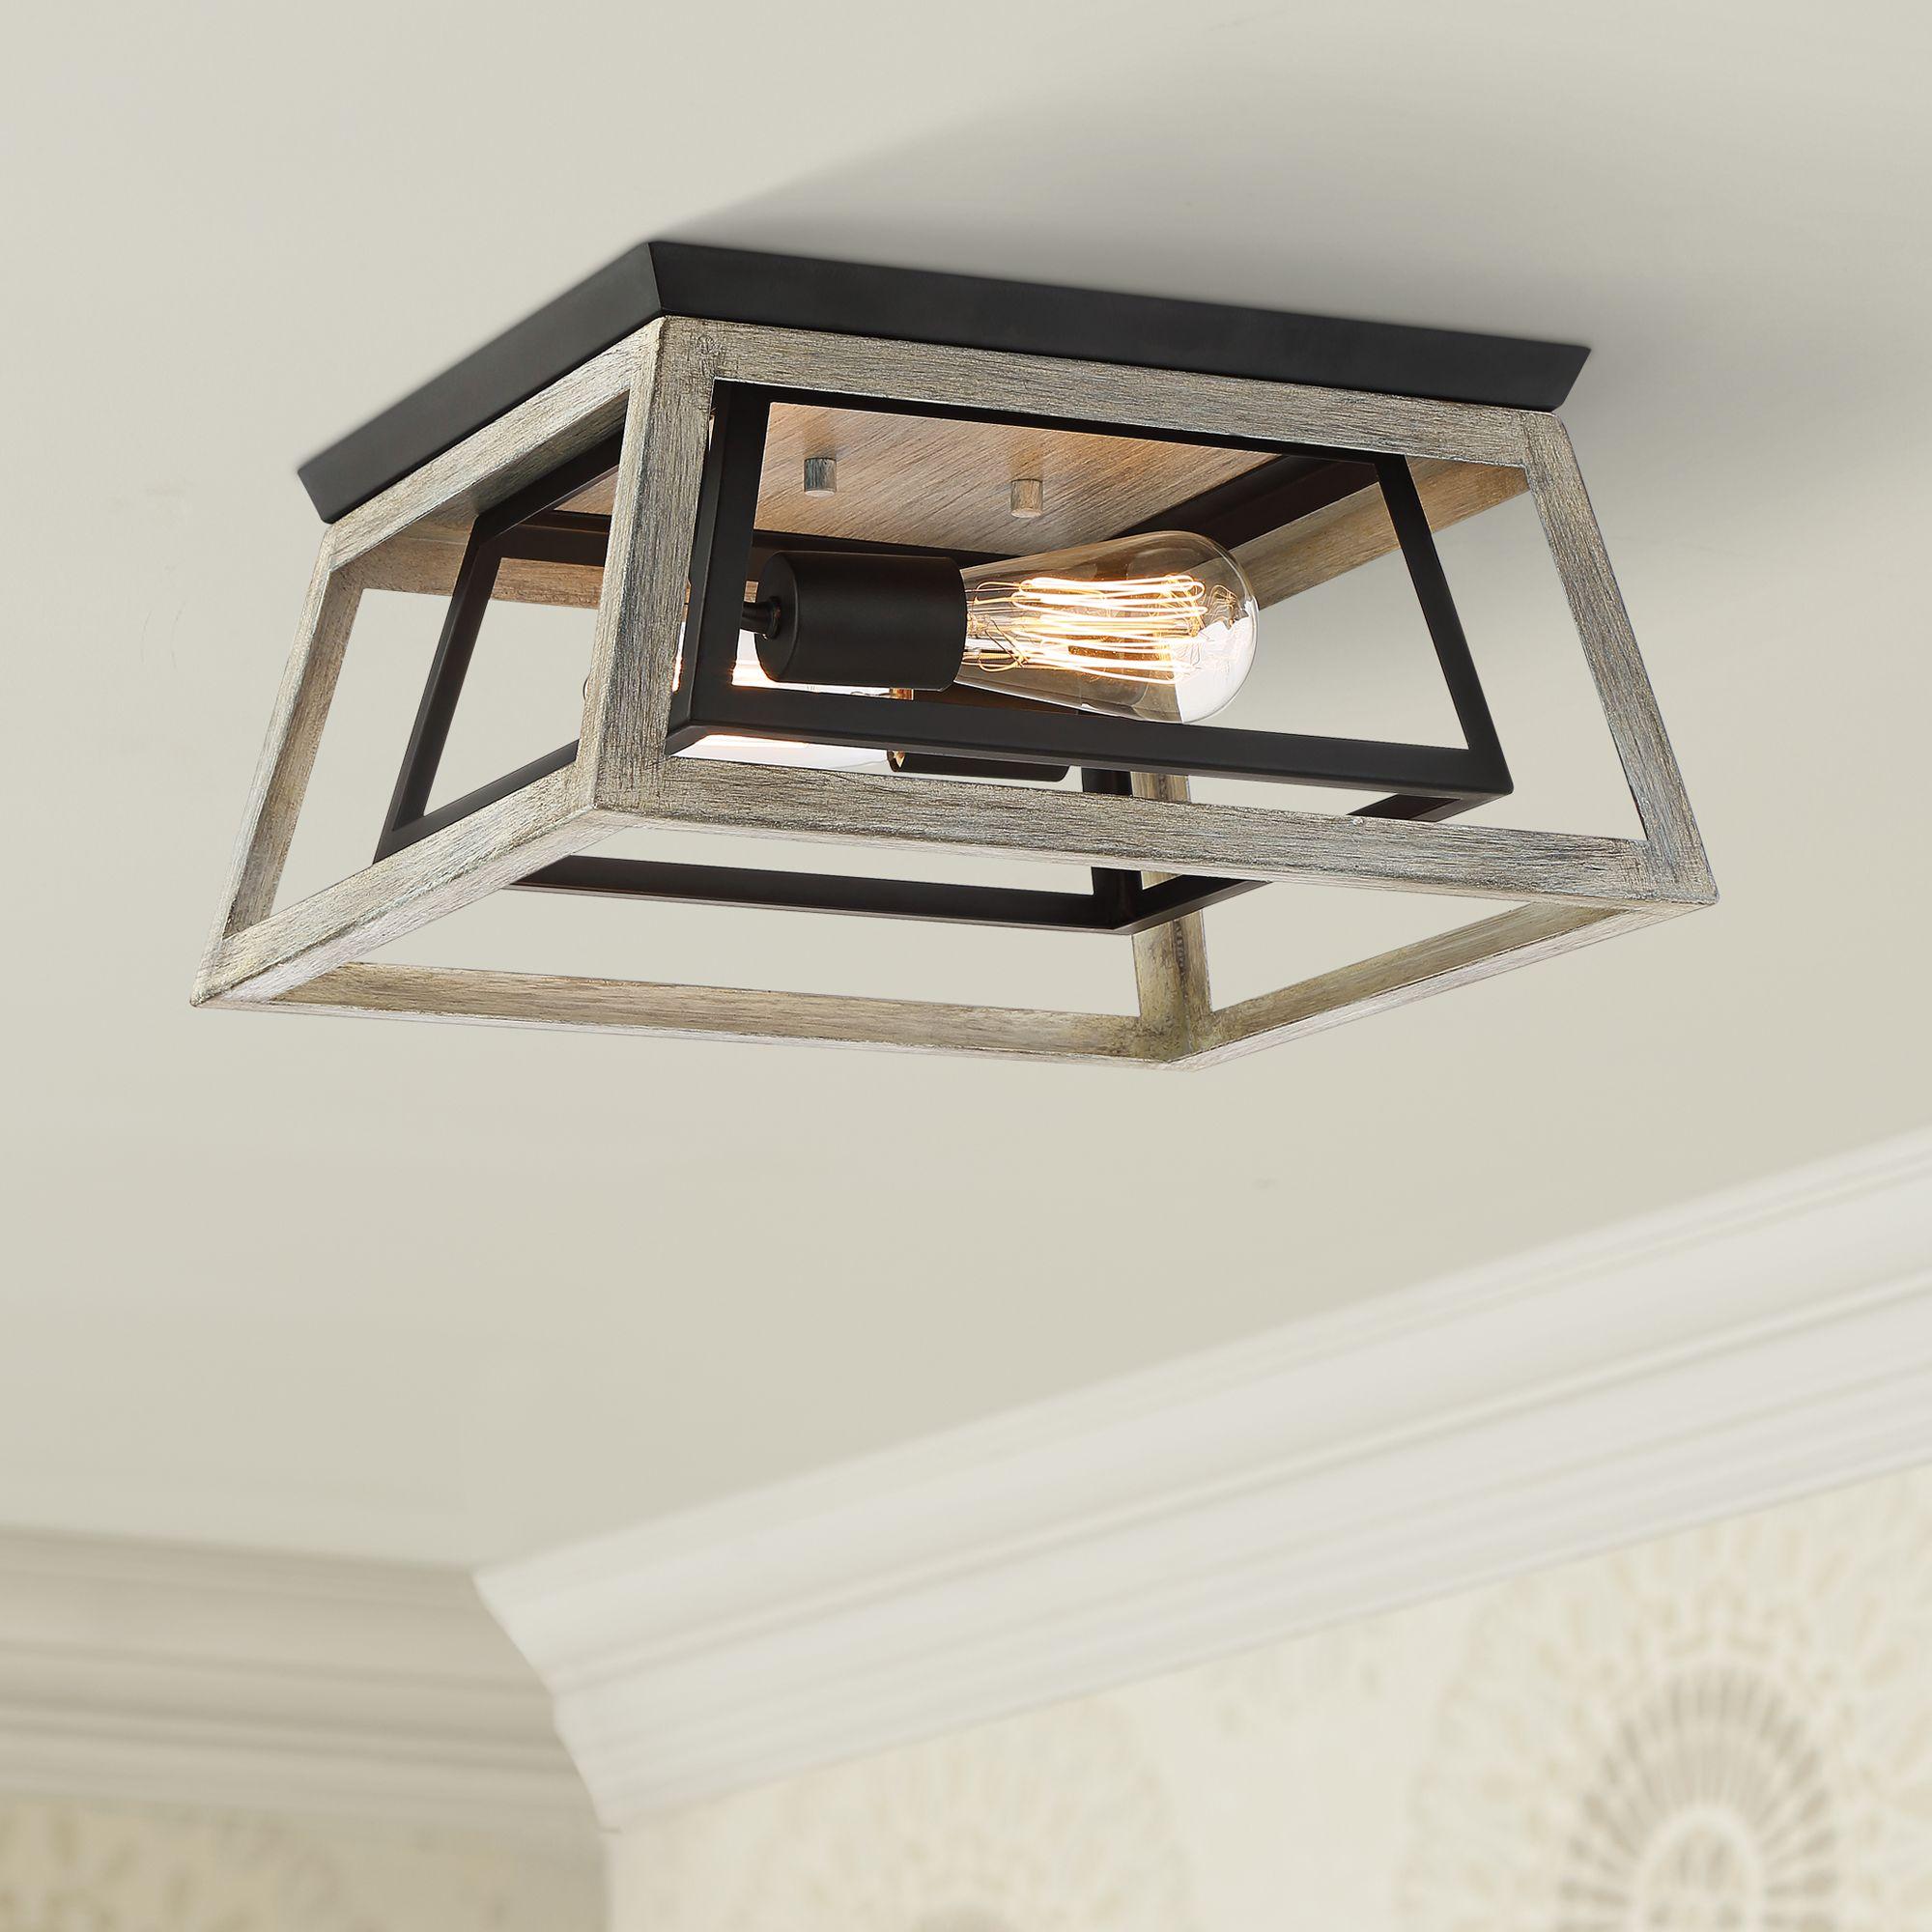 possini euro design farmhouse ceiling light flush mount fixture whitewashed wood black 14 wide open box bedroom kitchen hallway walmart com